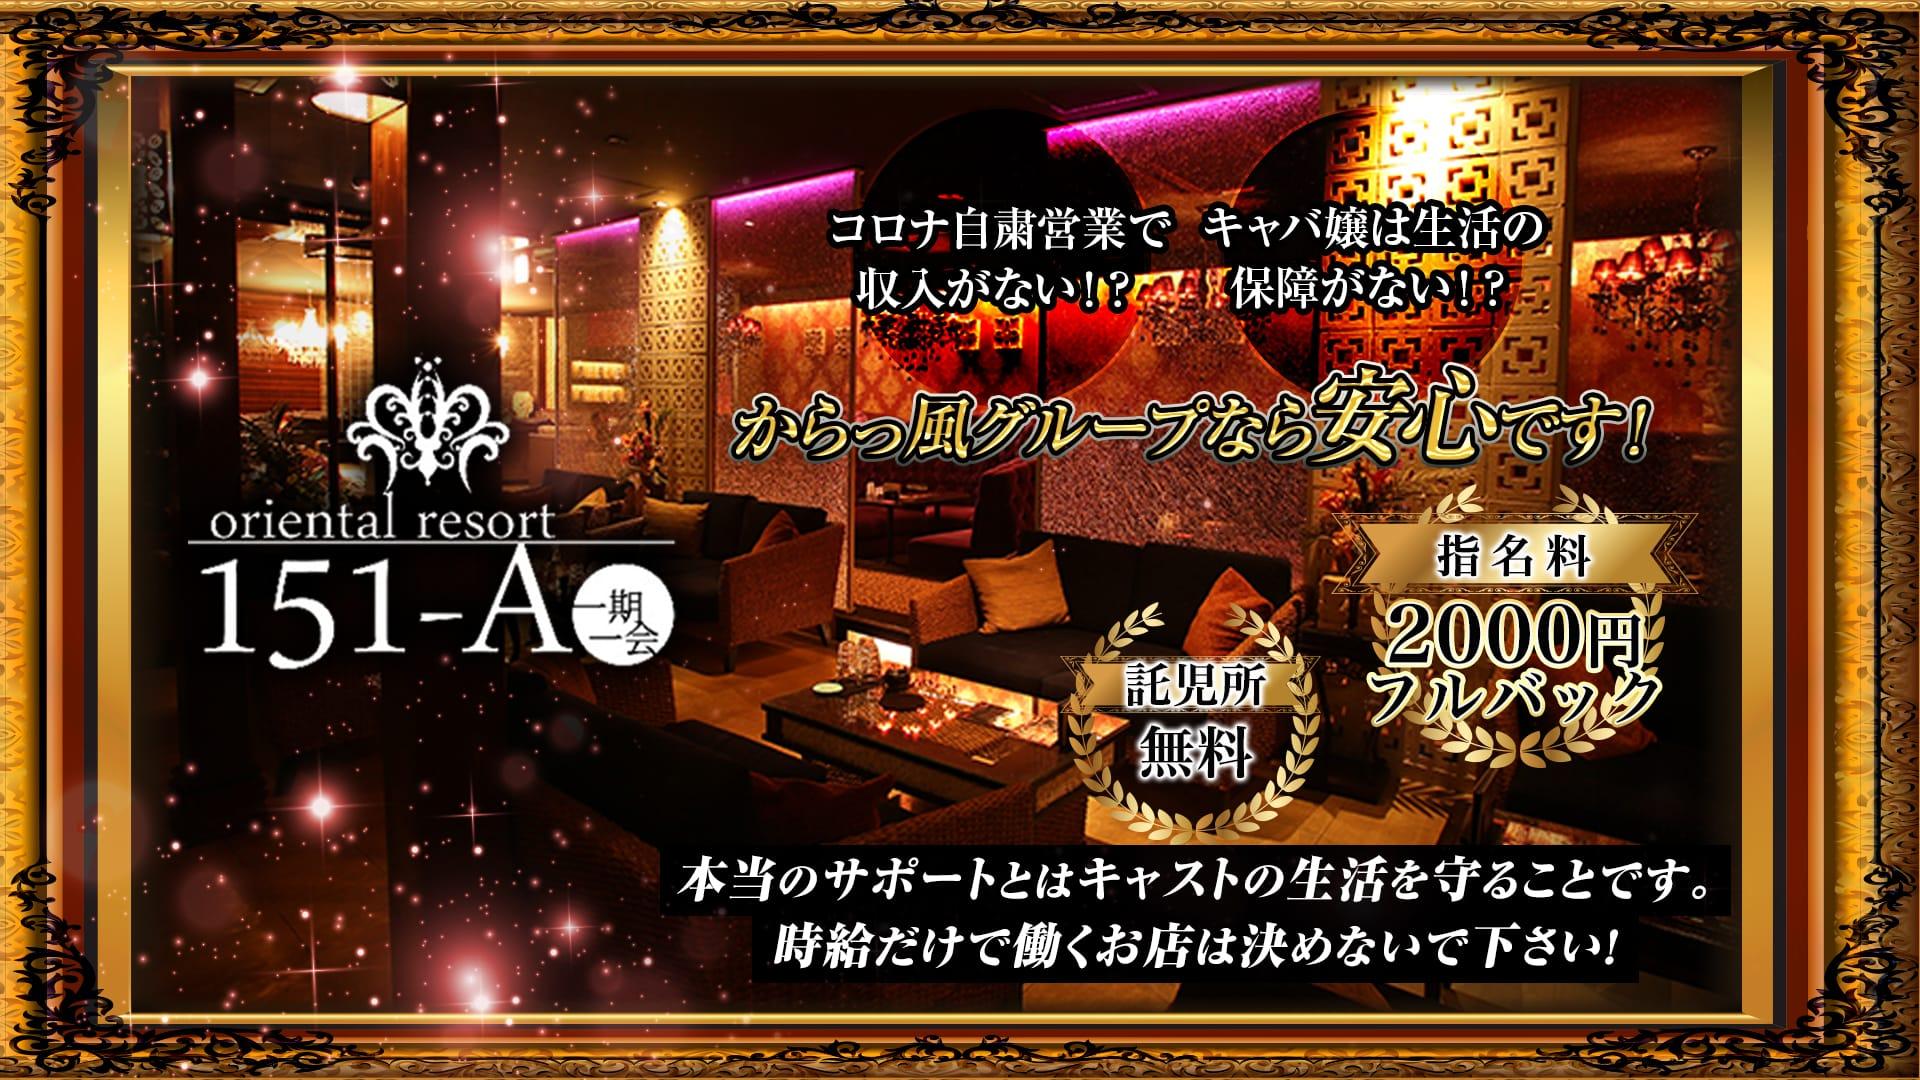 oriental resort 151-A(イチゴイチエ) 権堂キャバクラ TOP画像